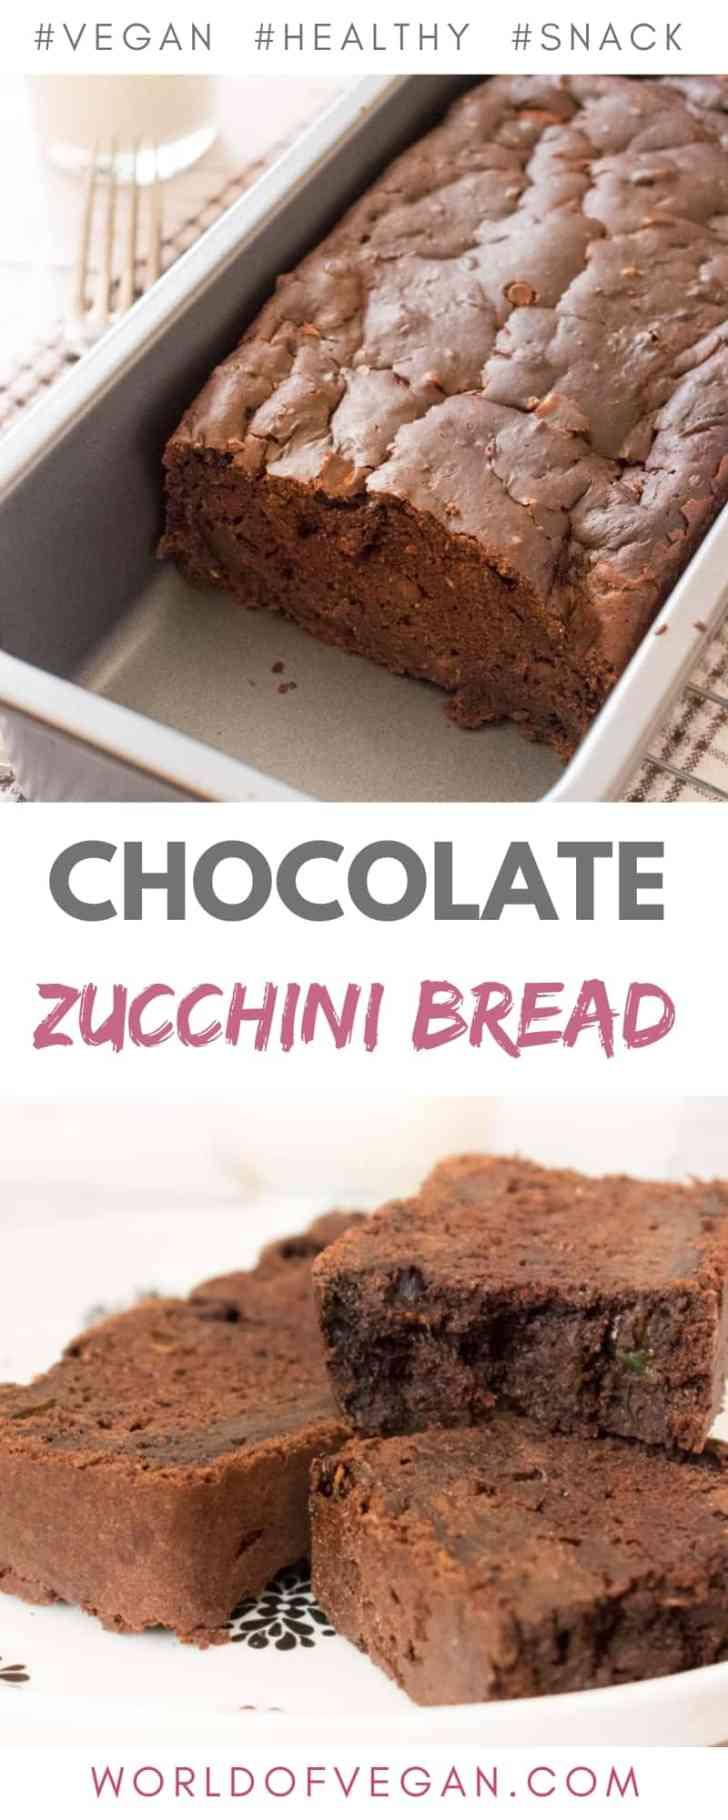 Vegan Chocolate Zucchini Bread   Easy Breakfast Recipe   #zucchini #chocolate #bread #vegan #dessert #breakfast #recipe #worldofvegan